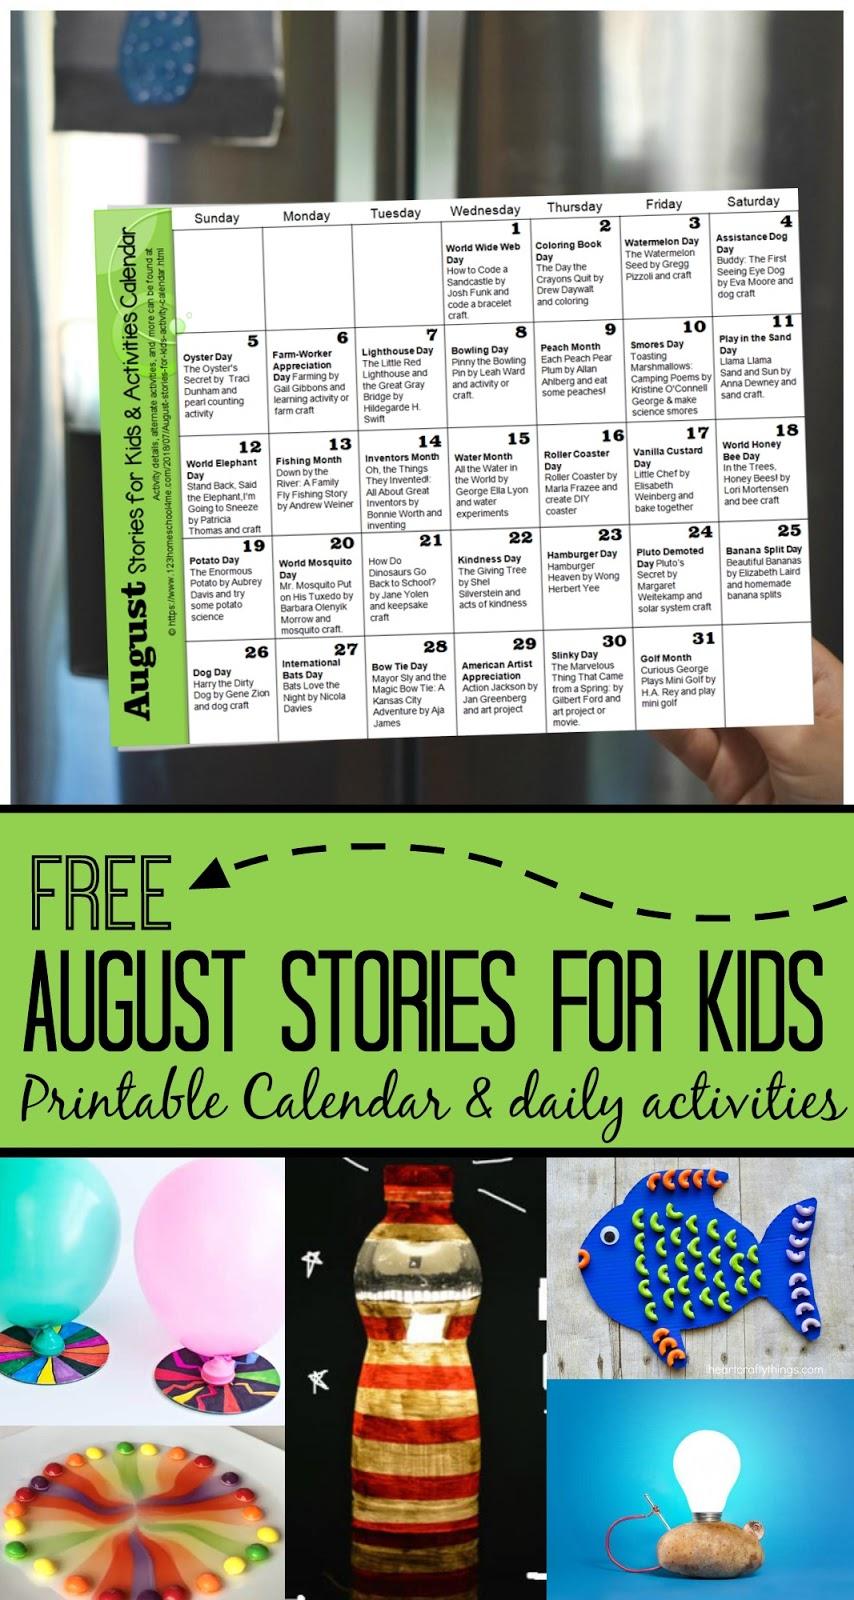 August Stories For Kids Activity Calendar